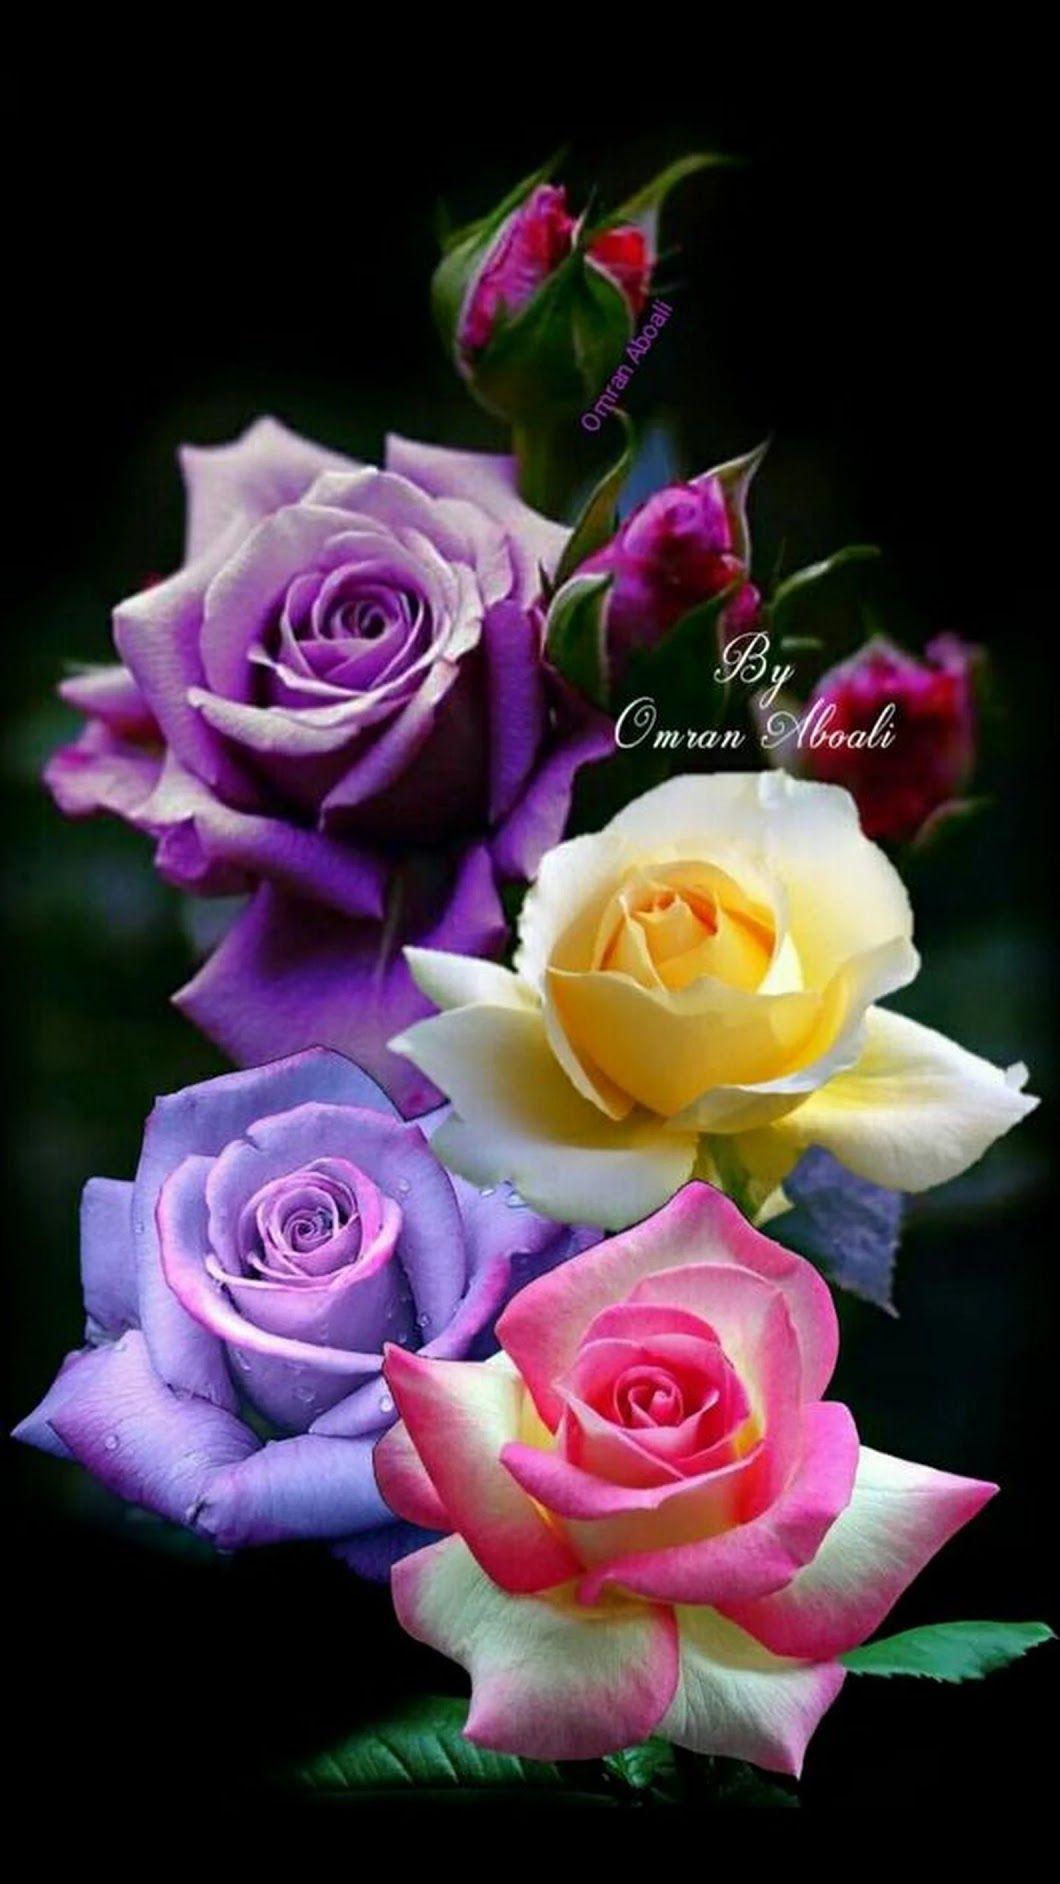 Pin by soekhoe urmila on bloem pinterest flowers rose and flower